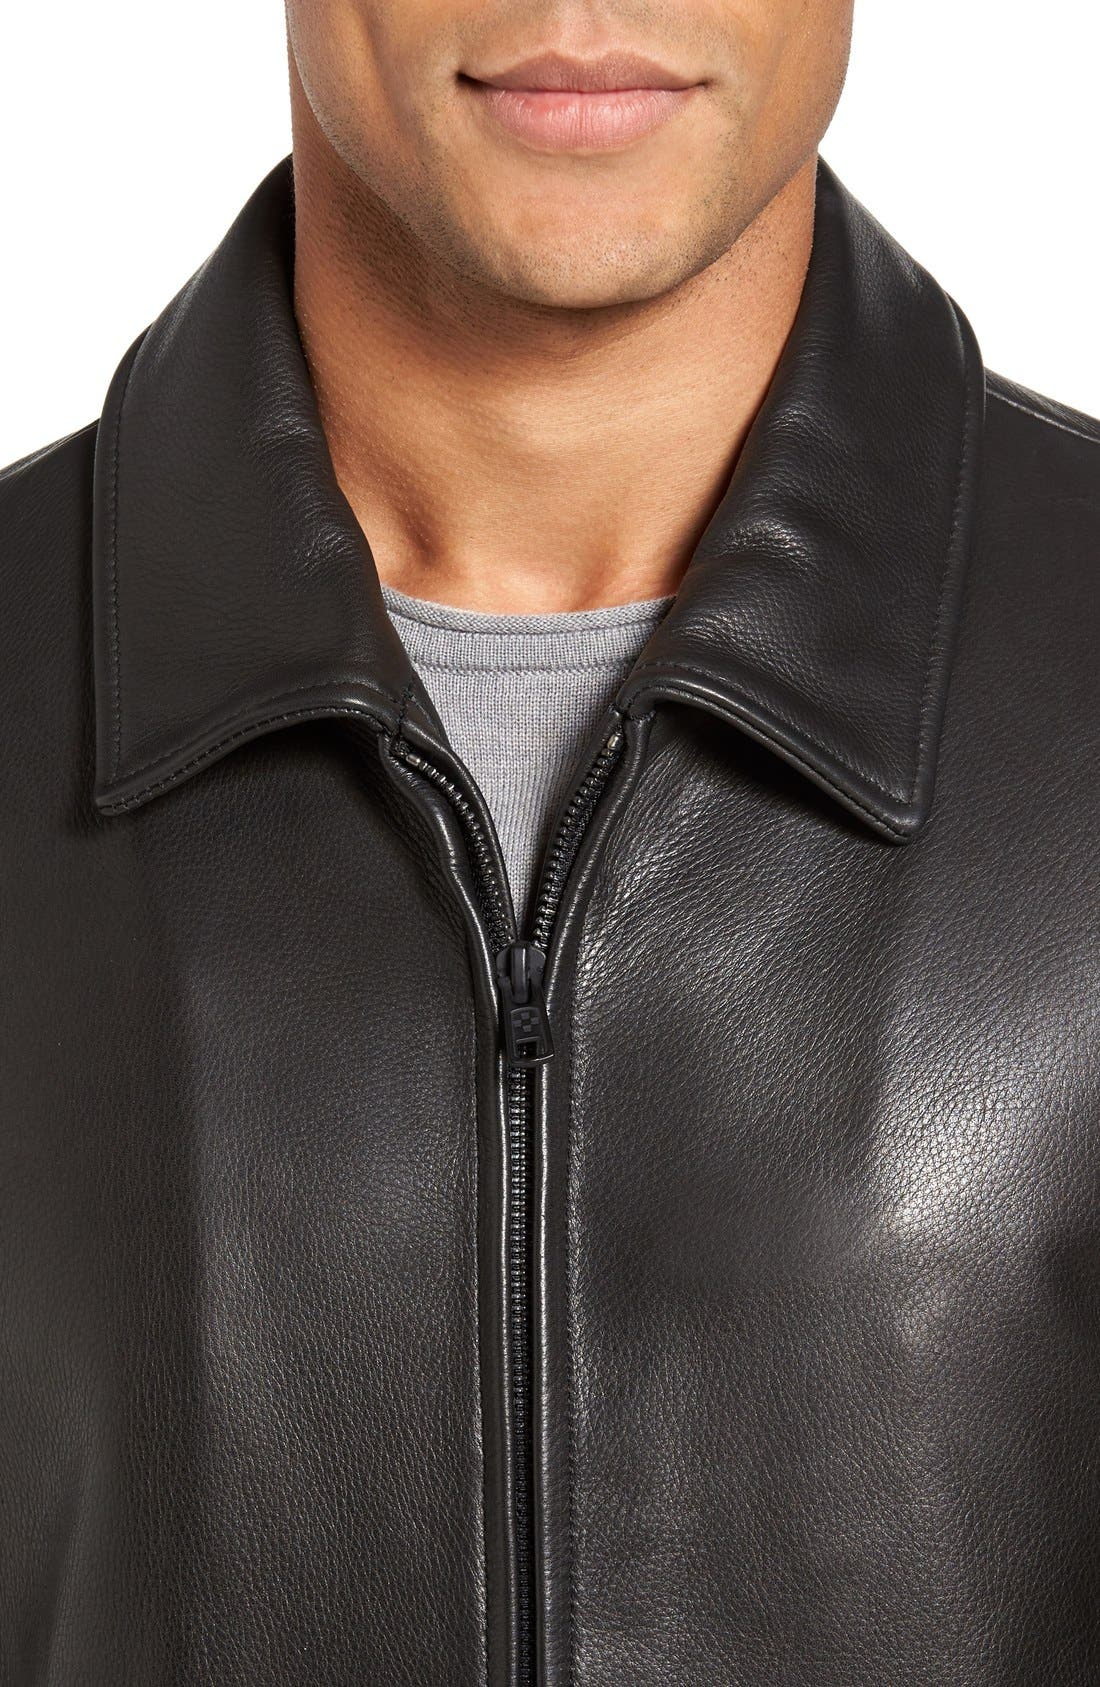 Leather Zip Front Jacket,                             Alternate thumbnail 4, color,                             001